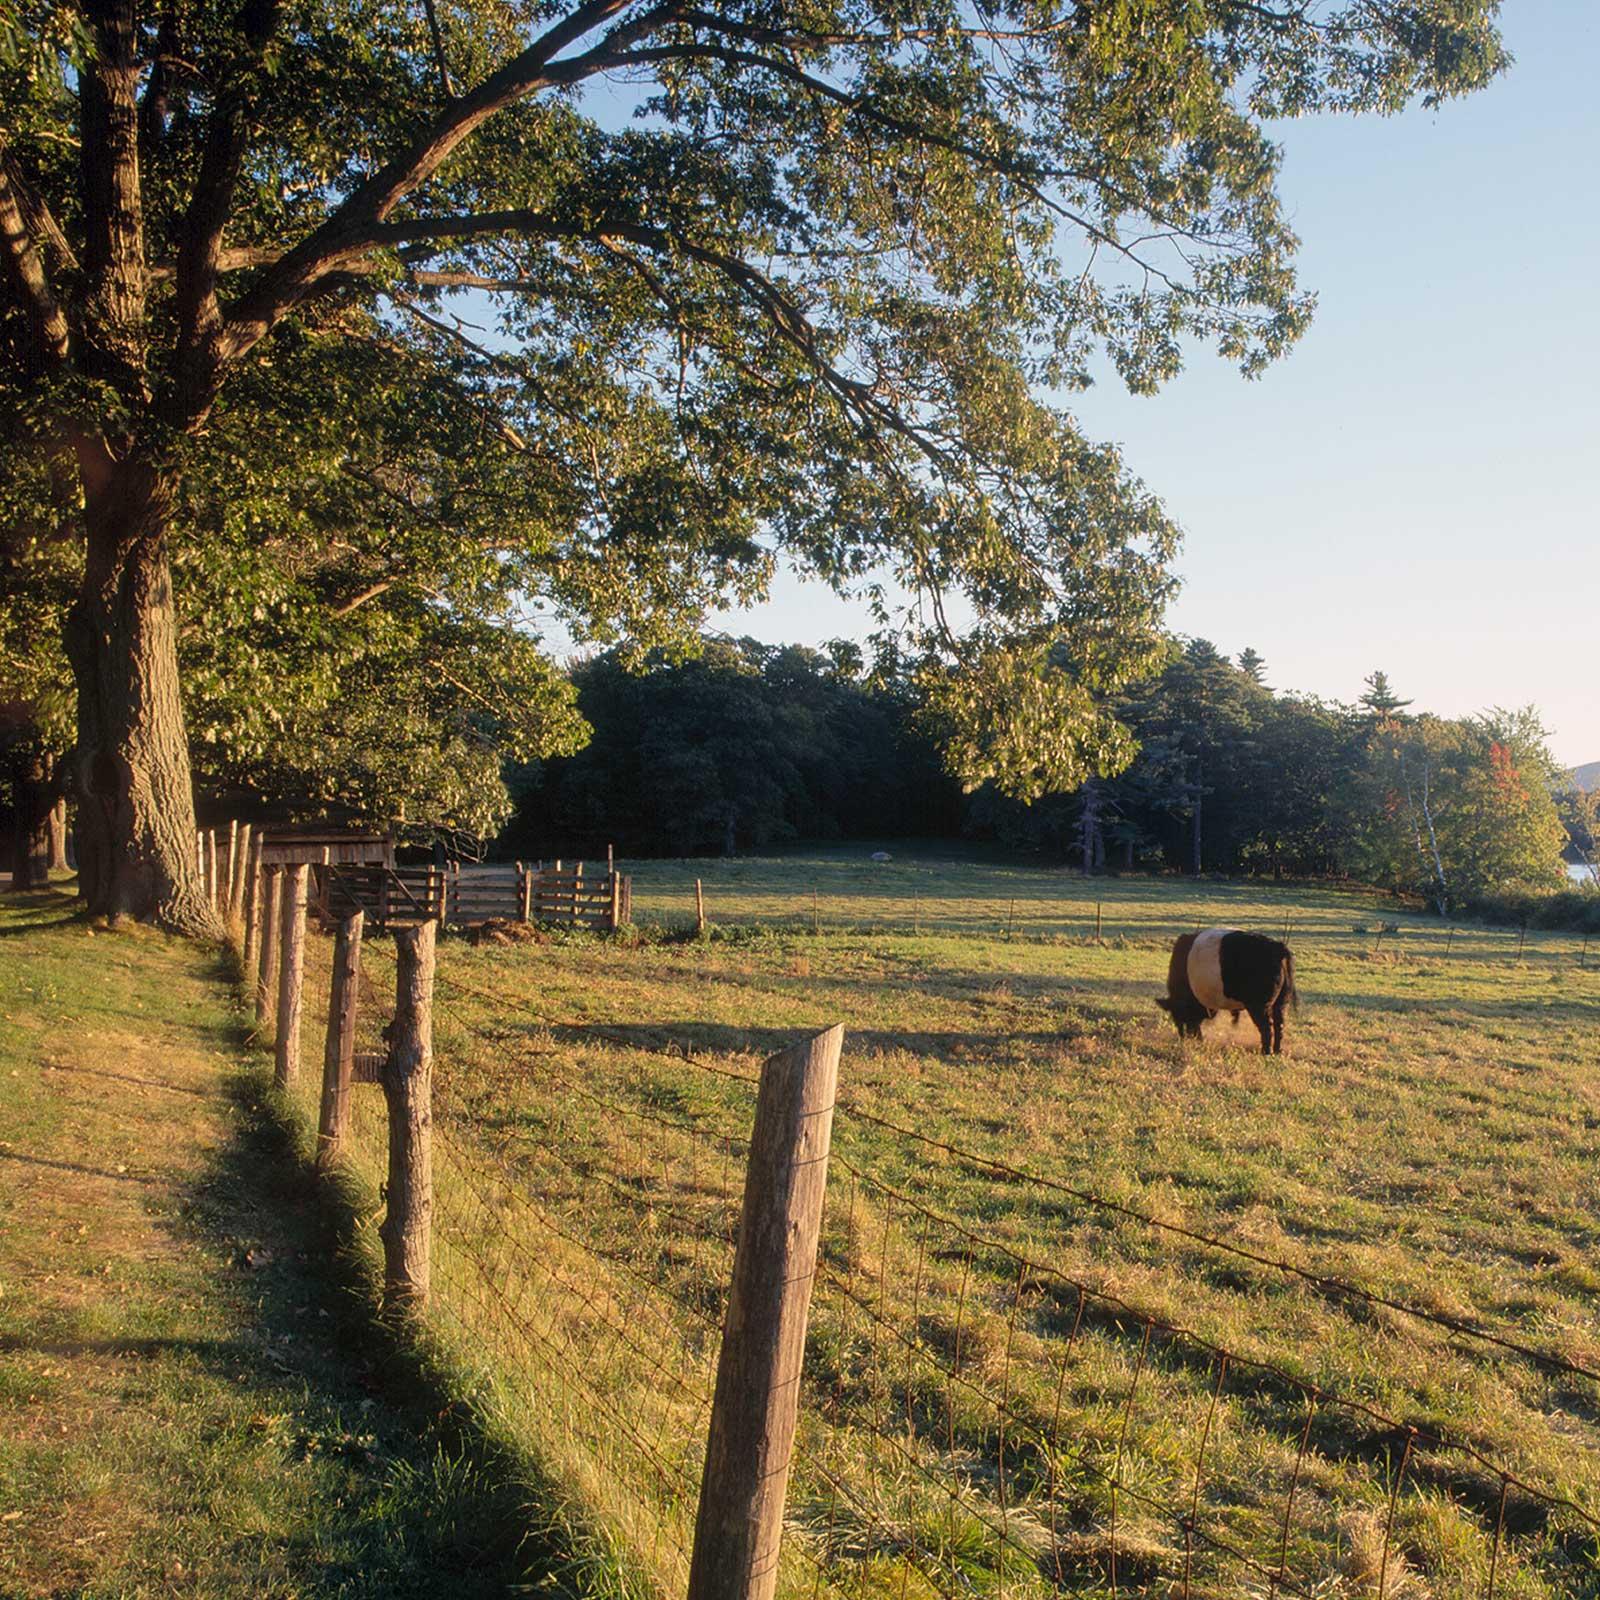 mcht-Aldermere_Farm_Rockport_Maine_5_-_2000_-_Sara_Gray-square